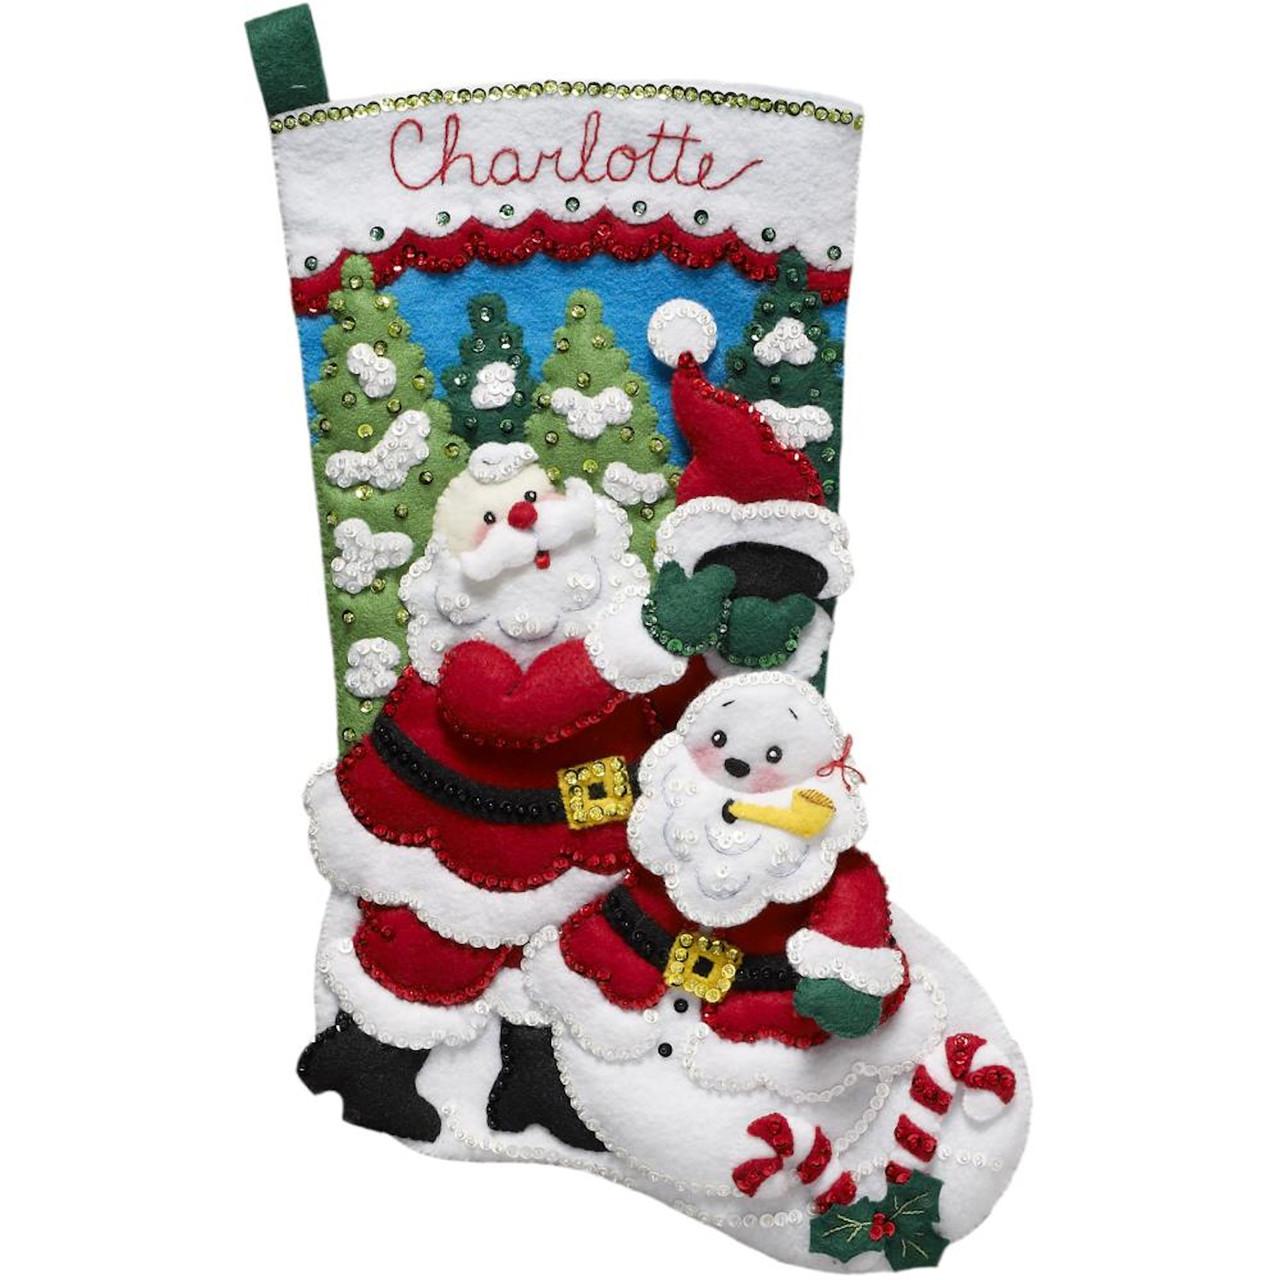 Plaid / Bucilla - Santa's Snowman Stocking